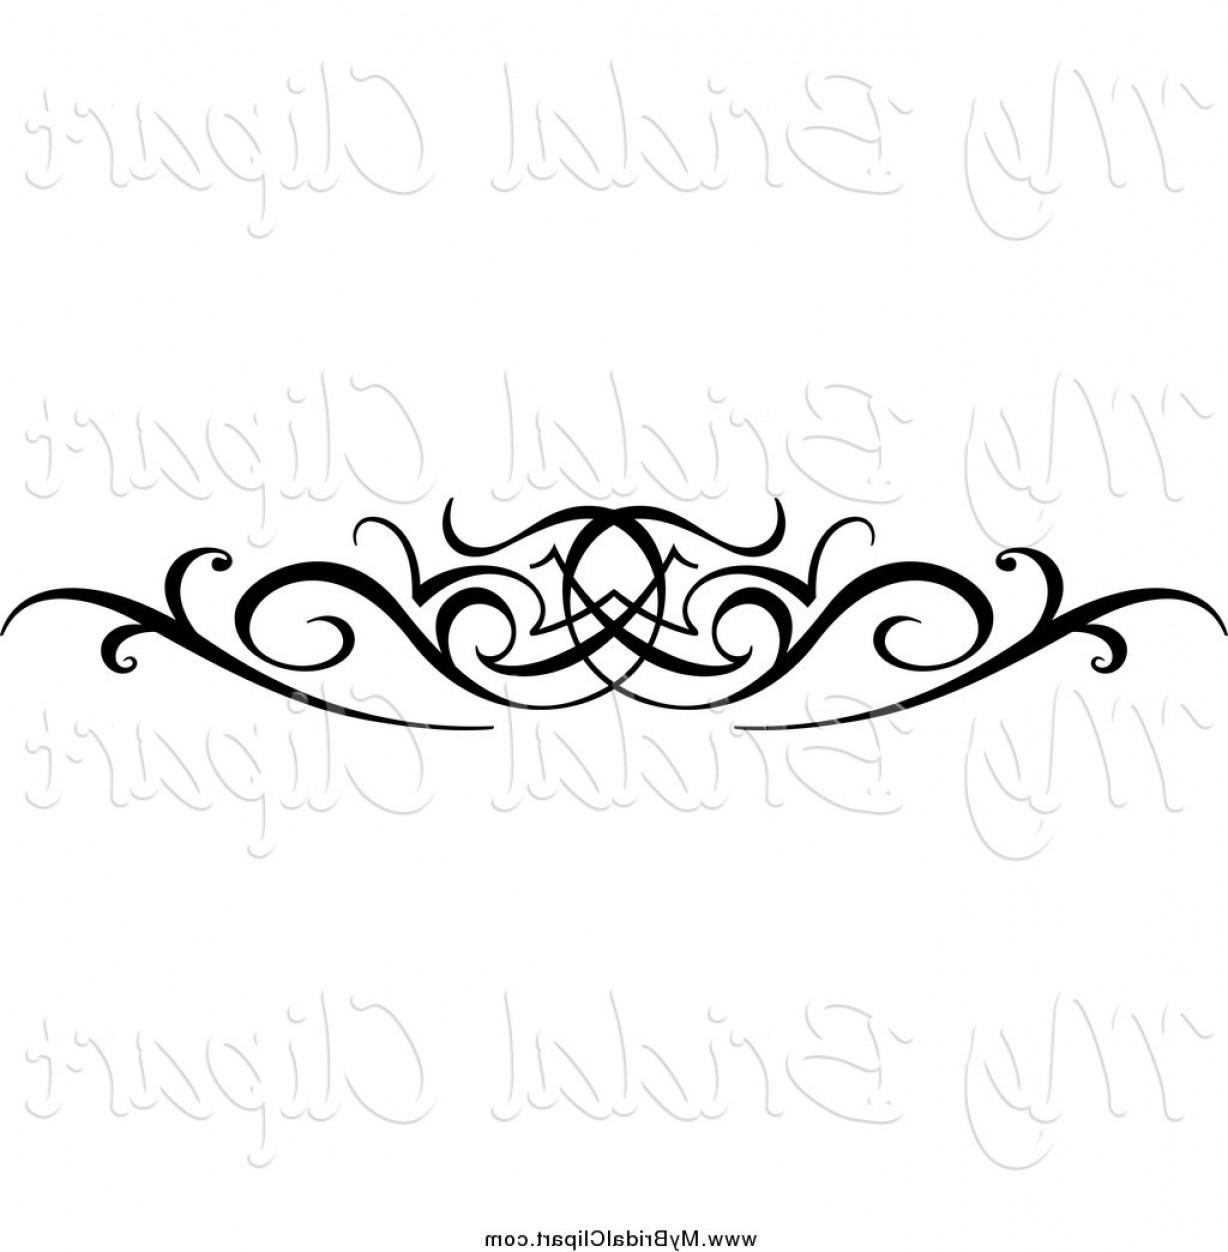 Black swirl design.